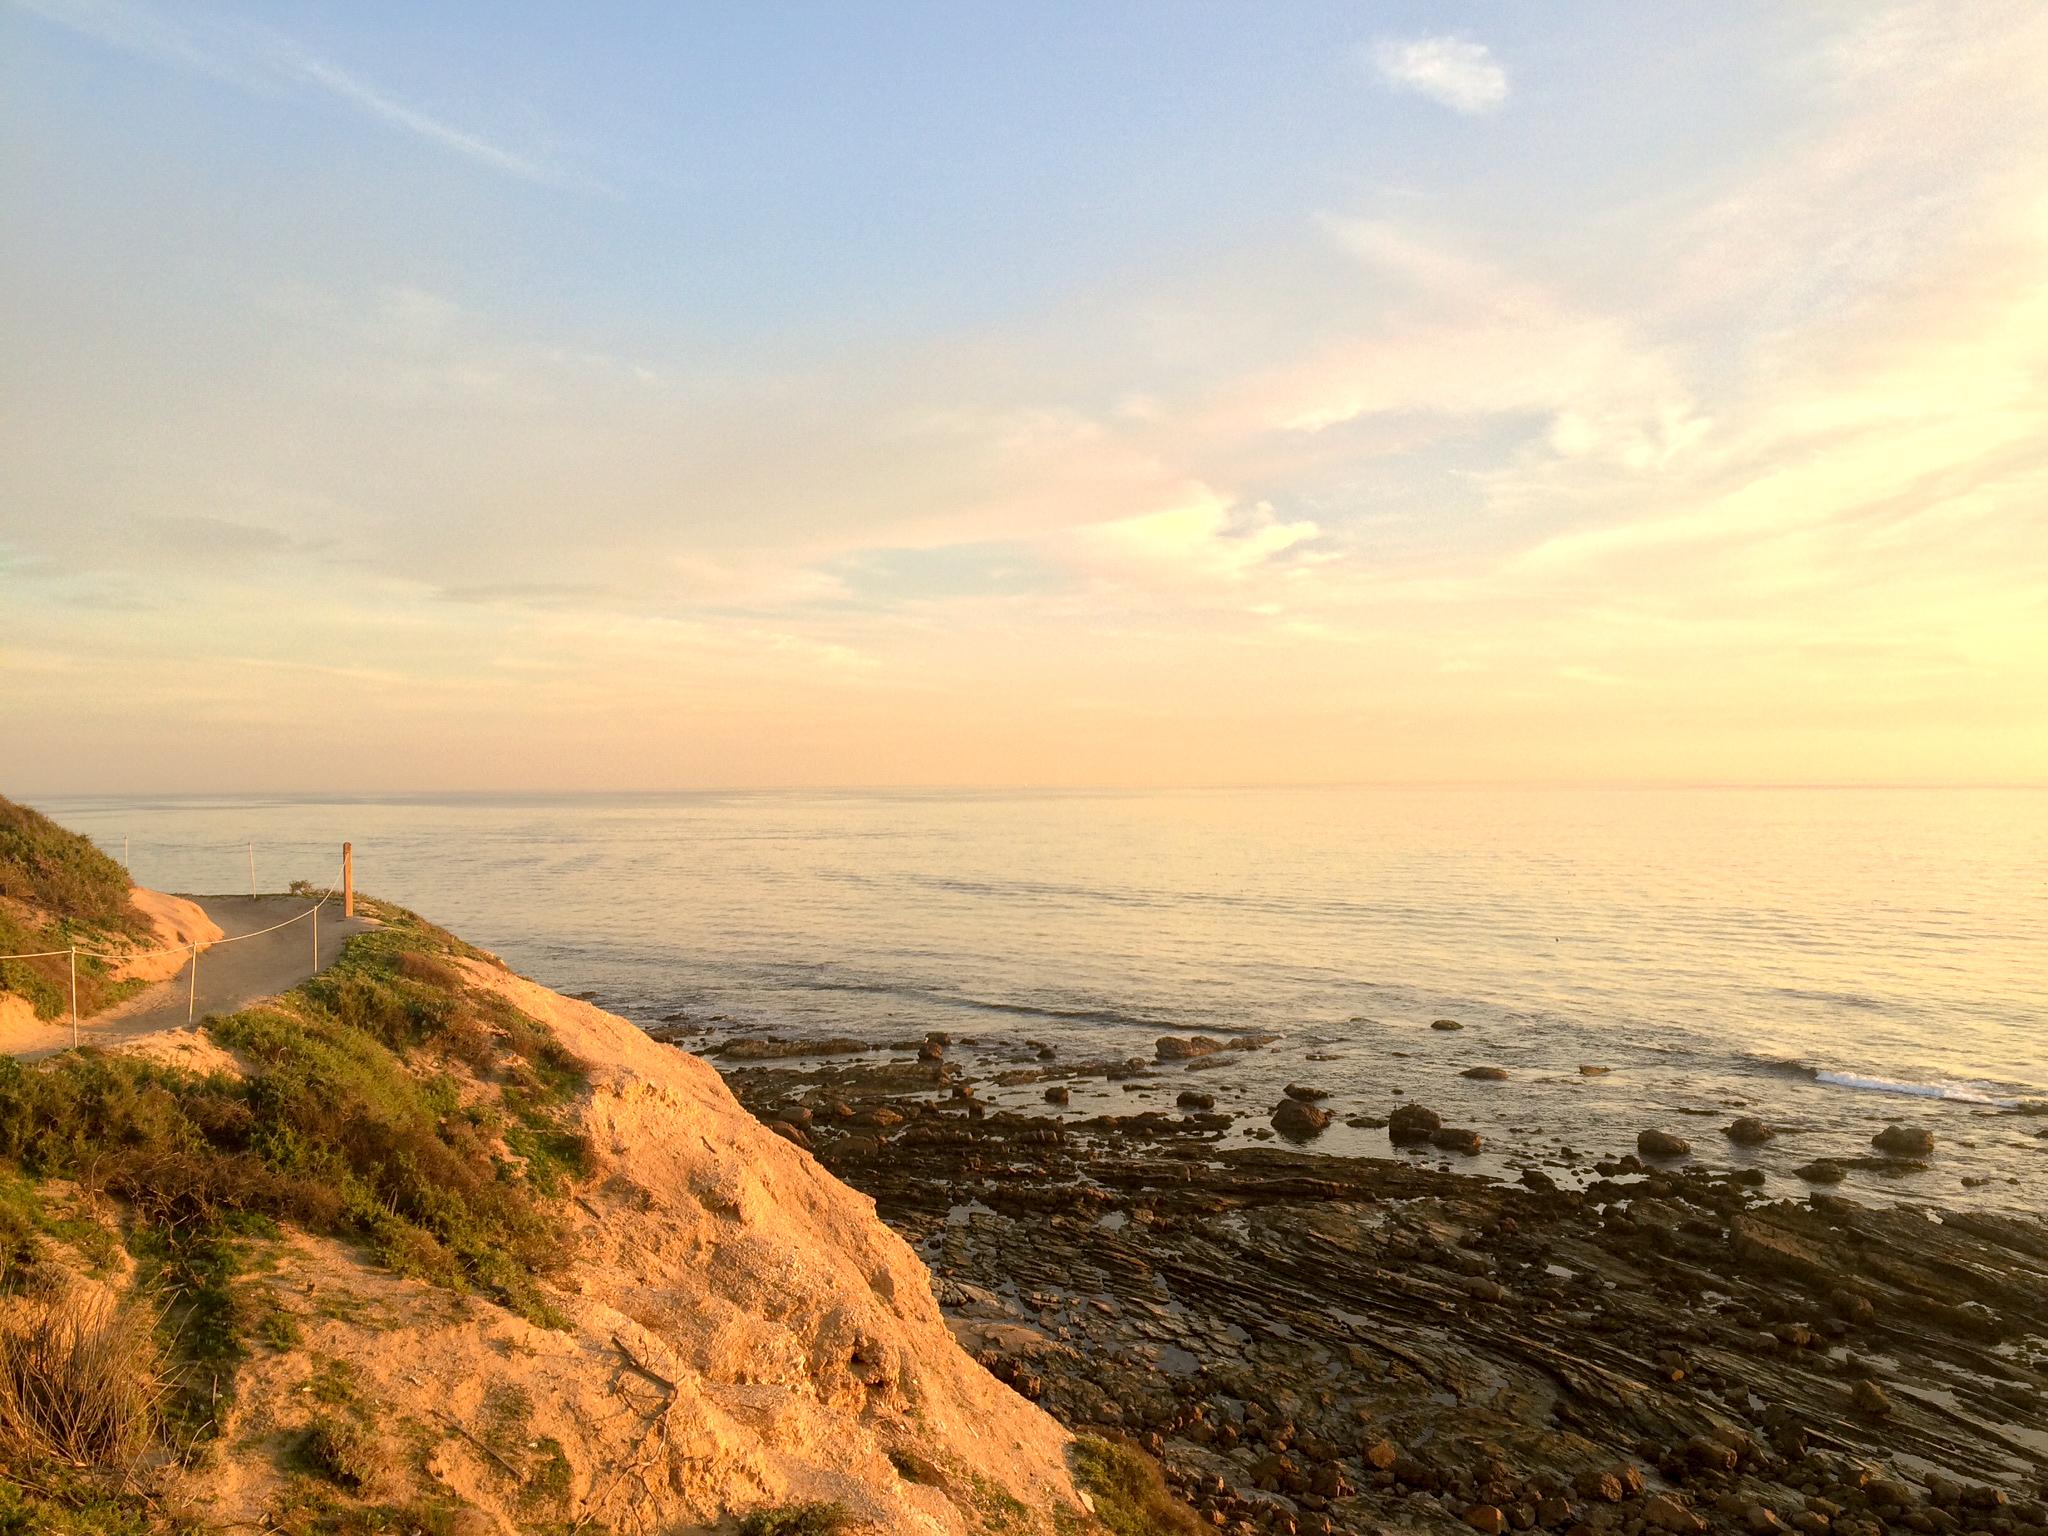 Looking towards Laguna.